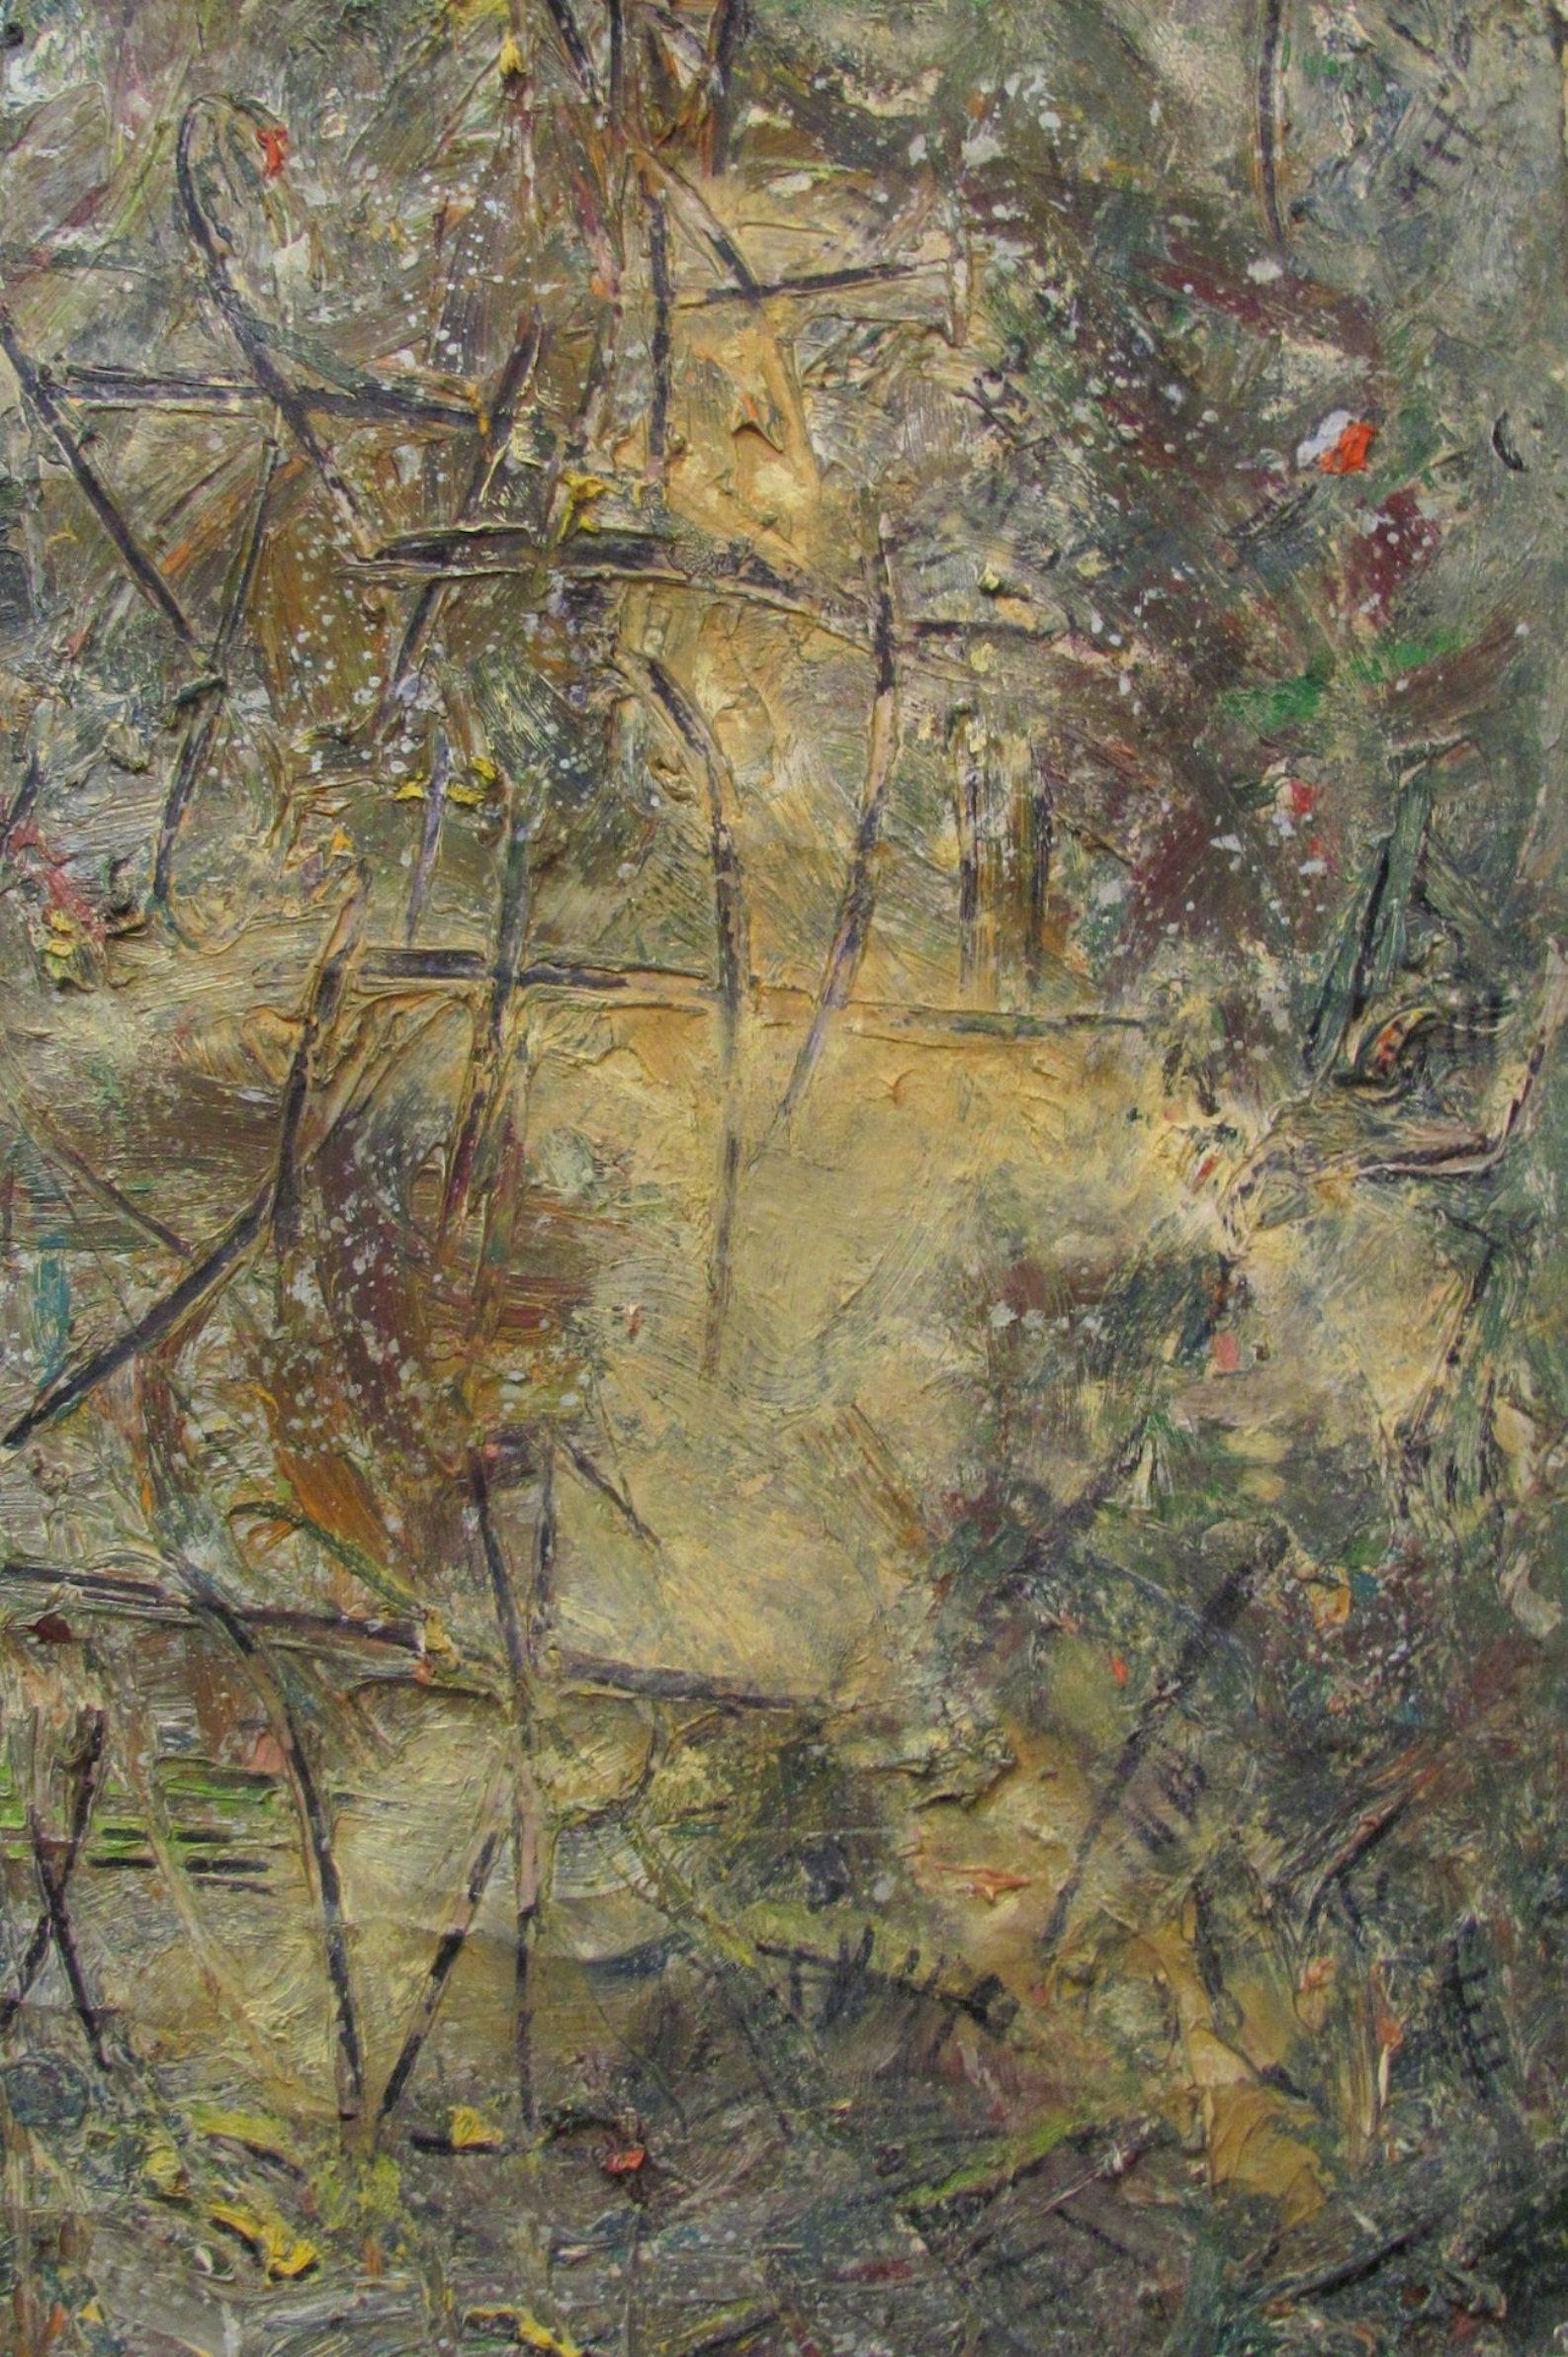 Sebanc_Wonder Oil on canvas 25 X 39 2012.jpg